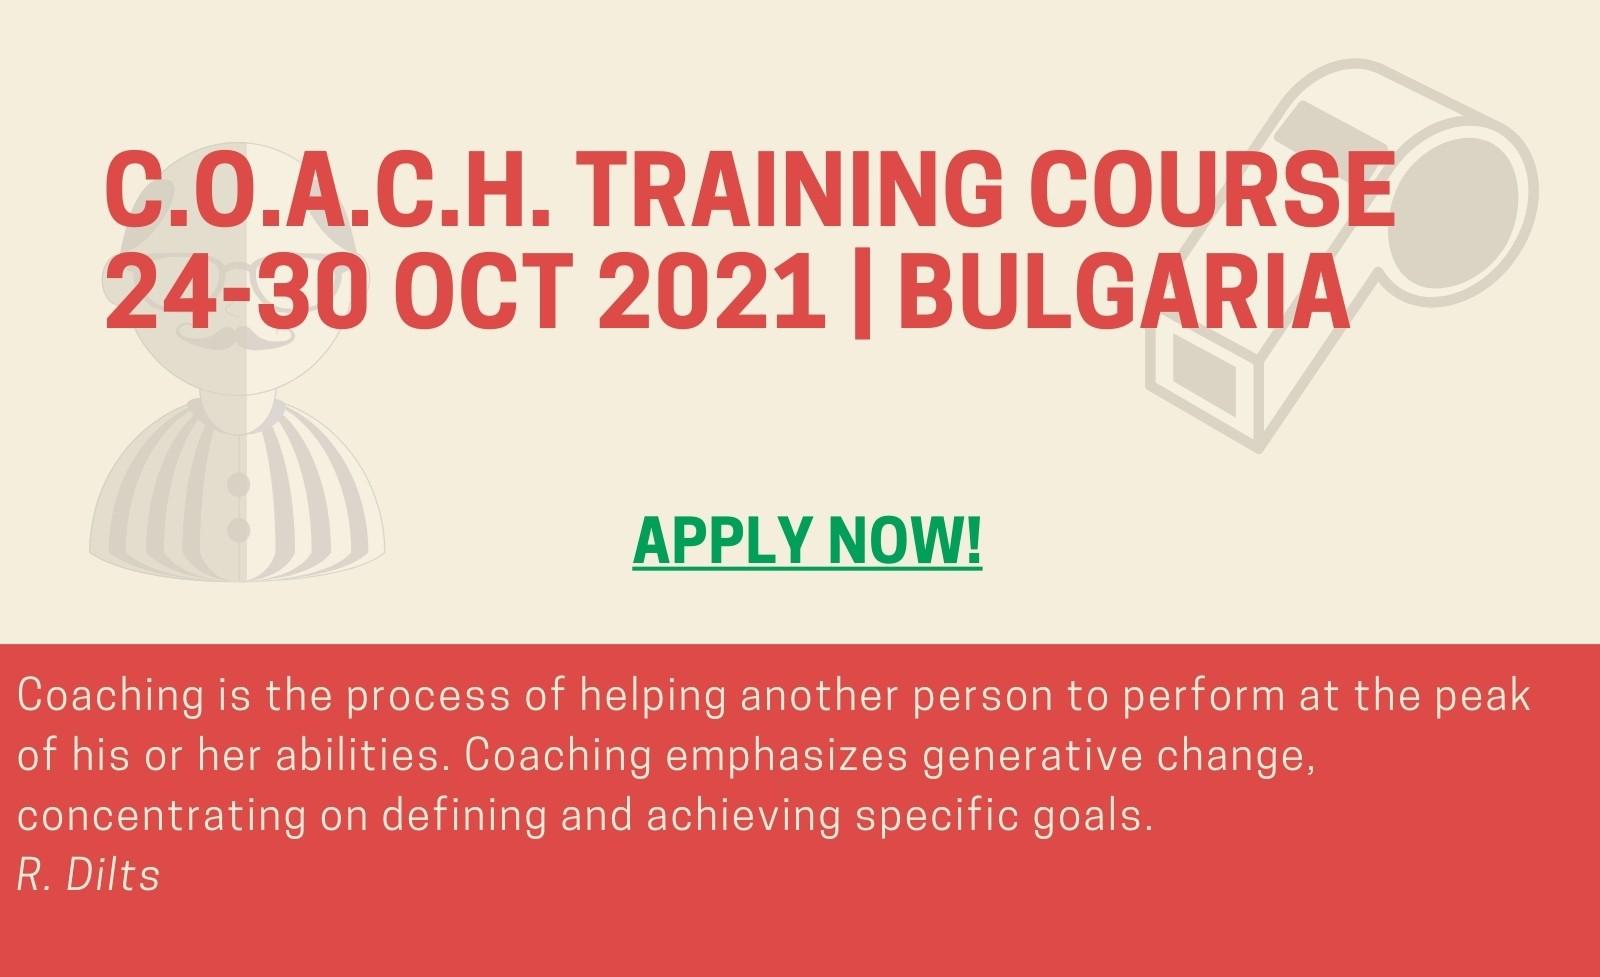 smokinya_coach-training-course-in-bulgaria-2_007.jpg